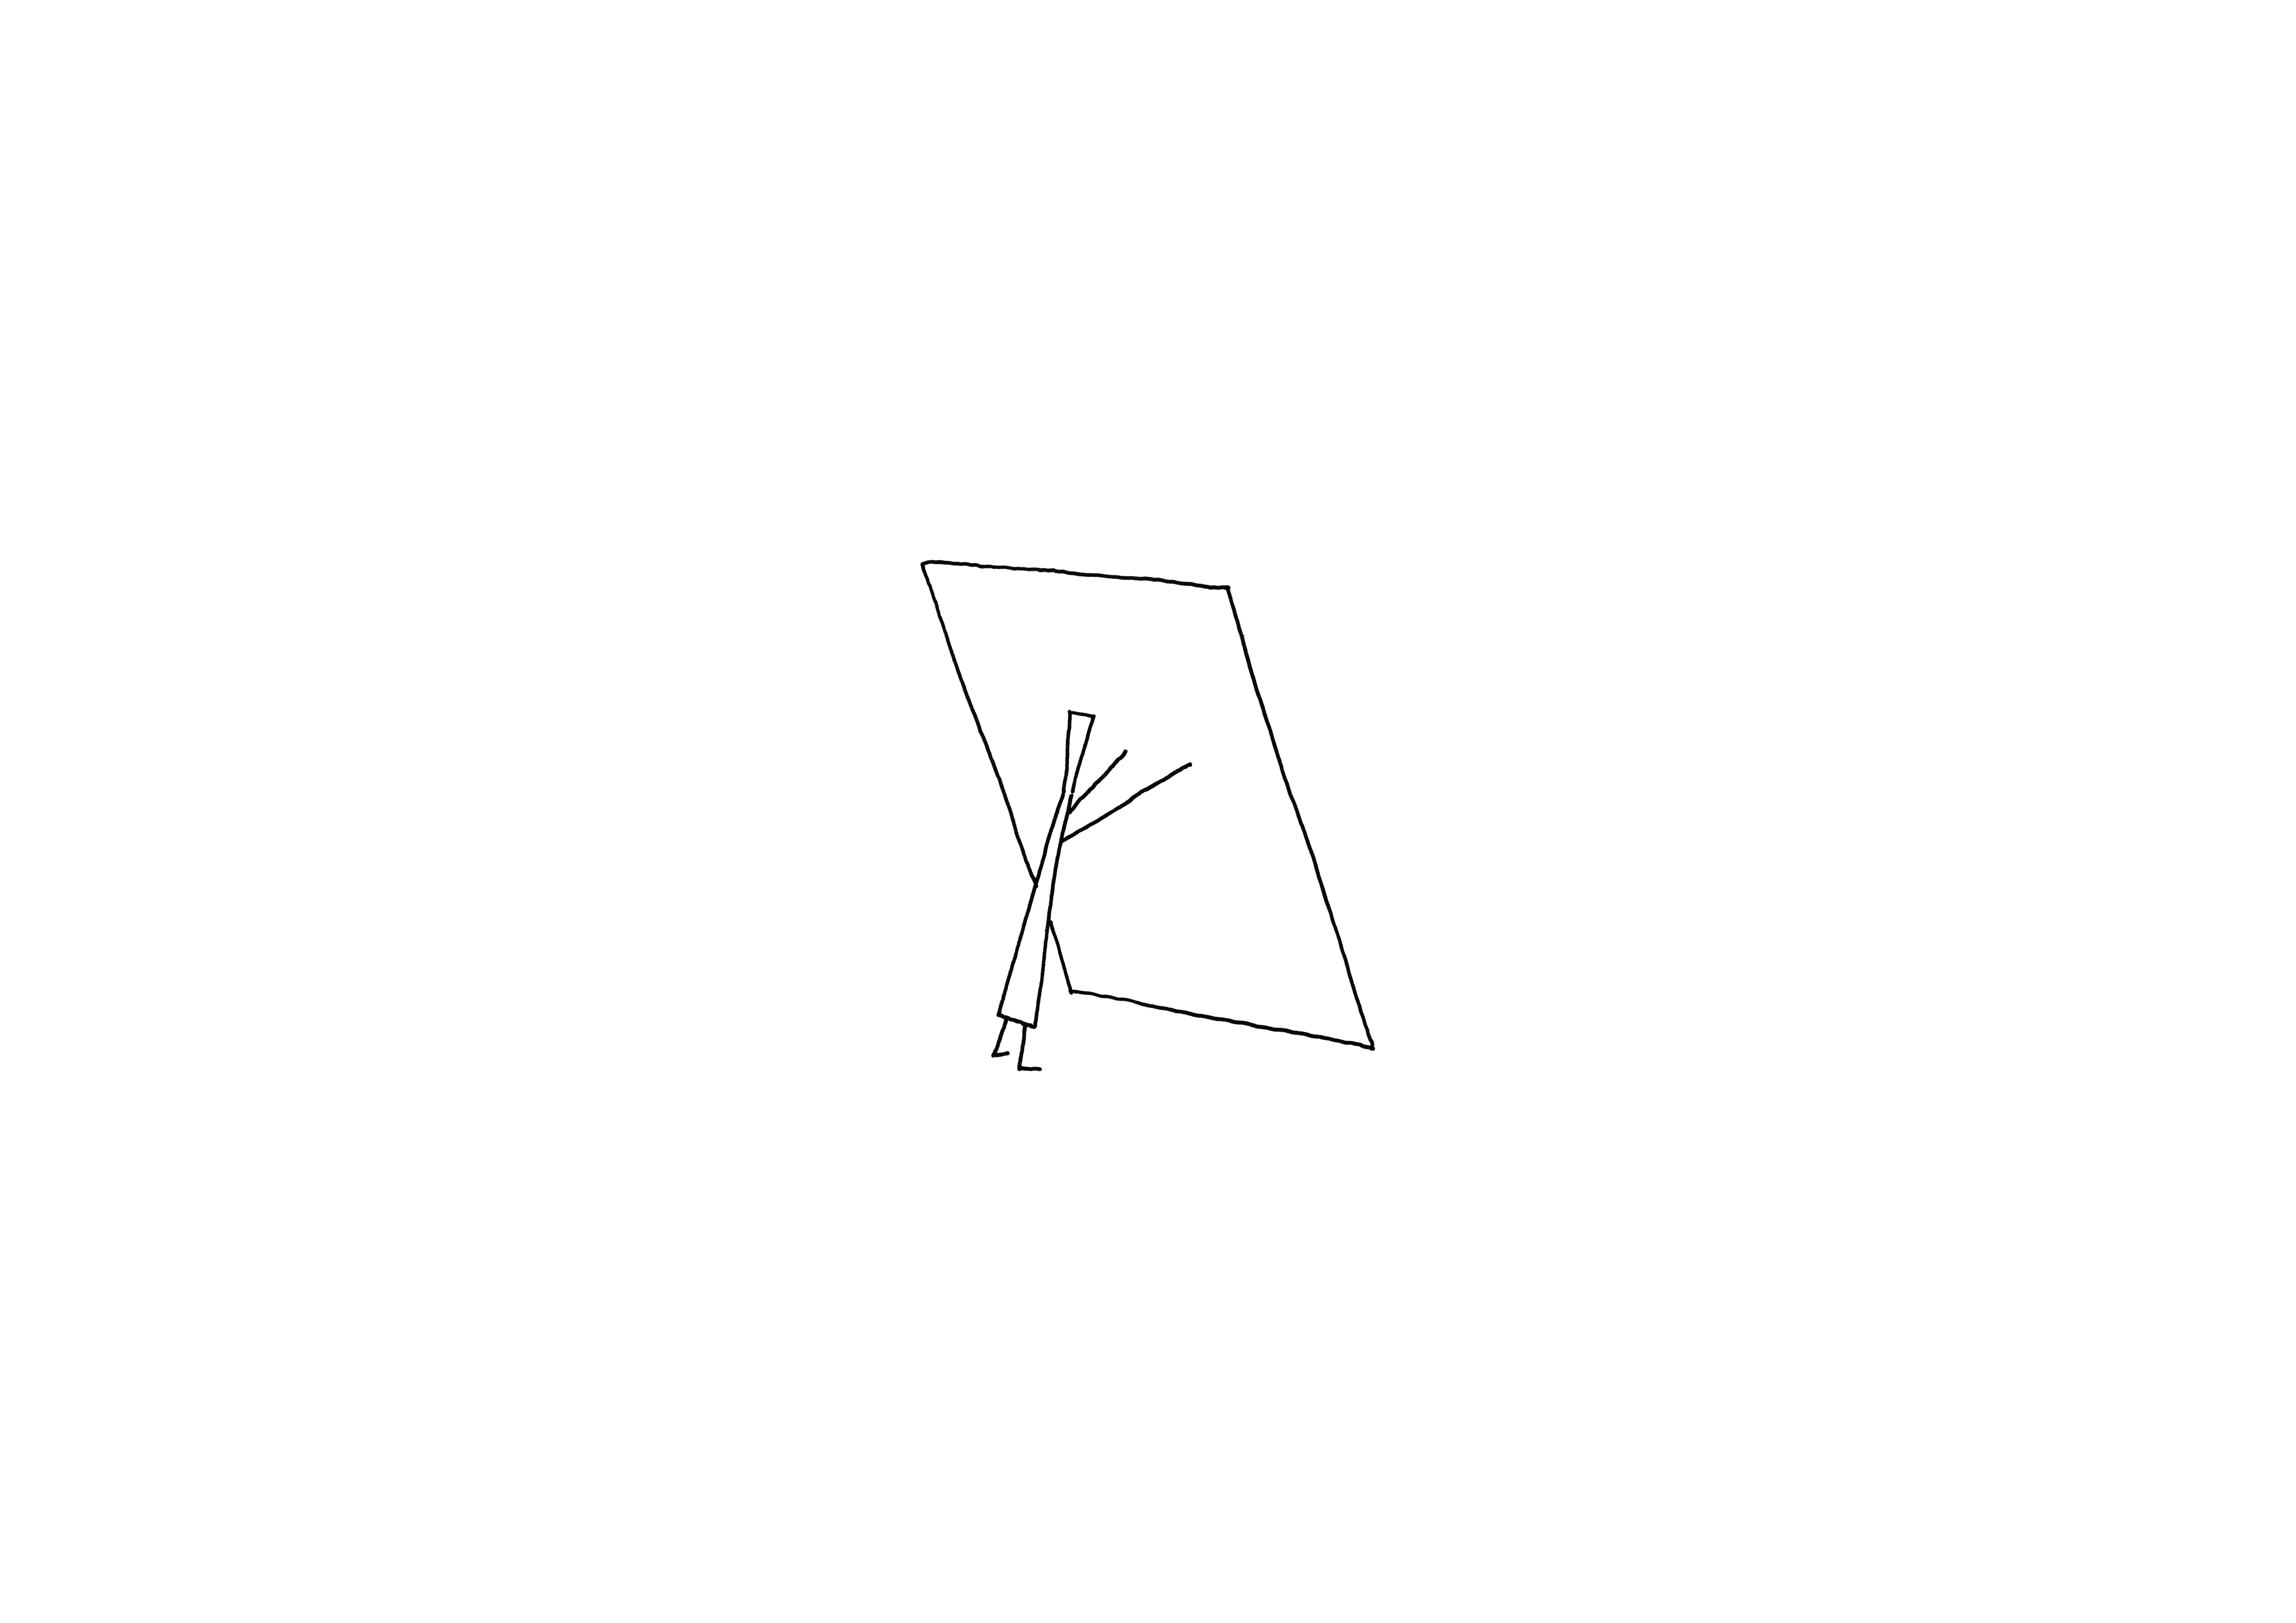 lean_sketch